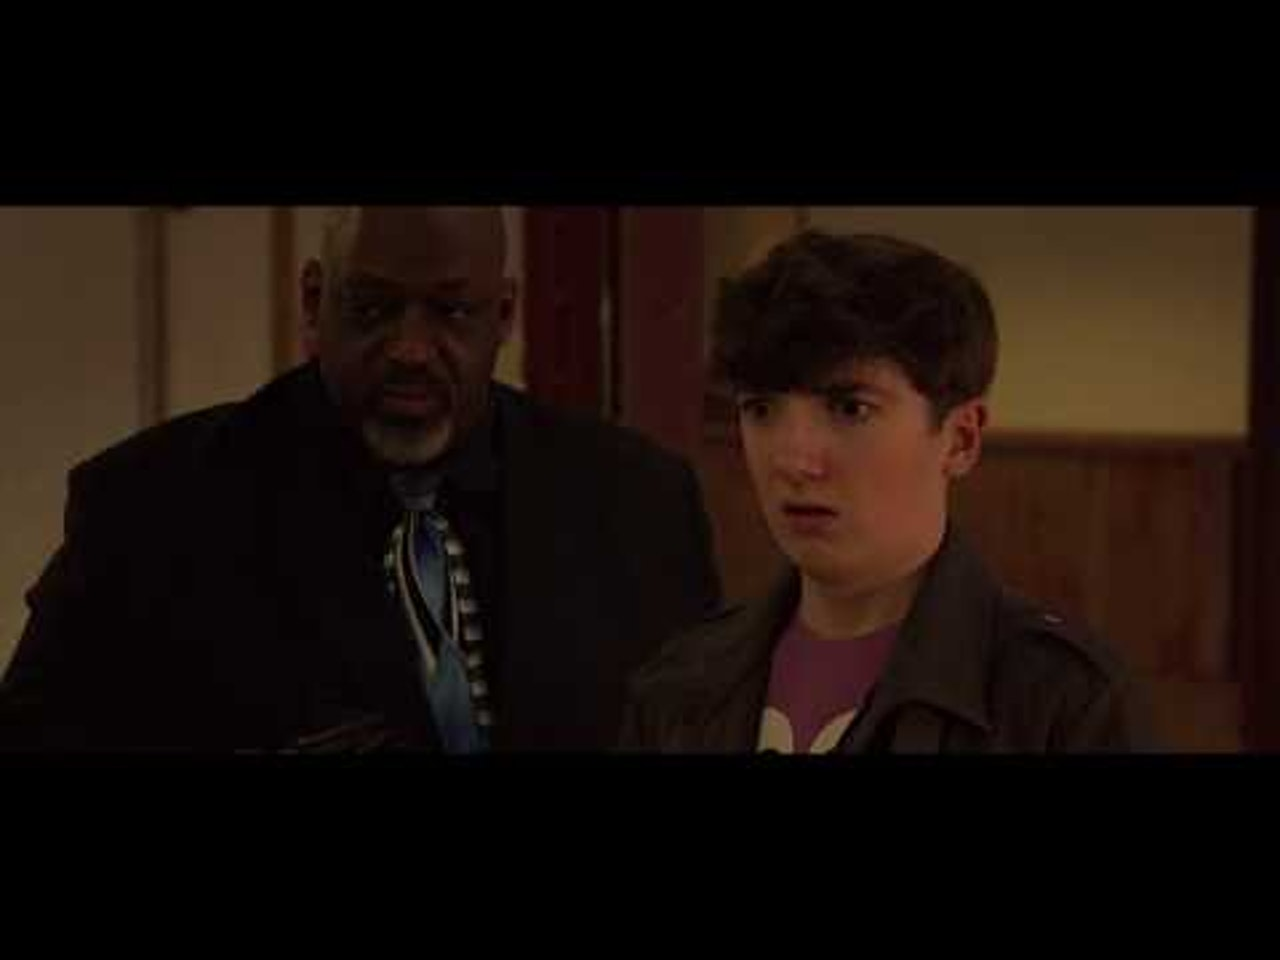 Meatballs - Short Film Trailer